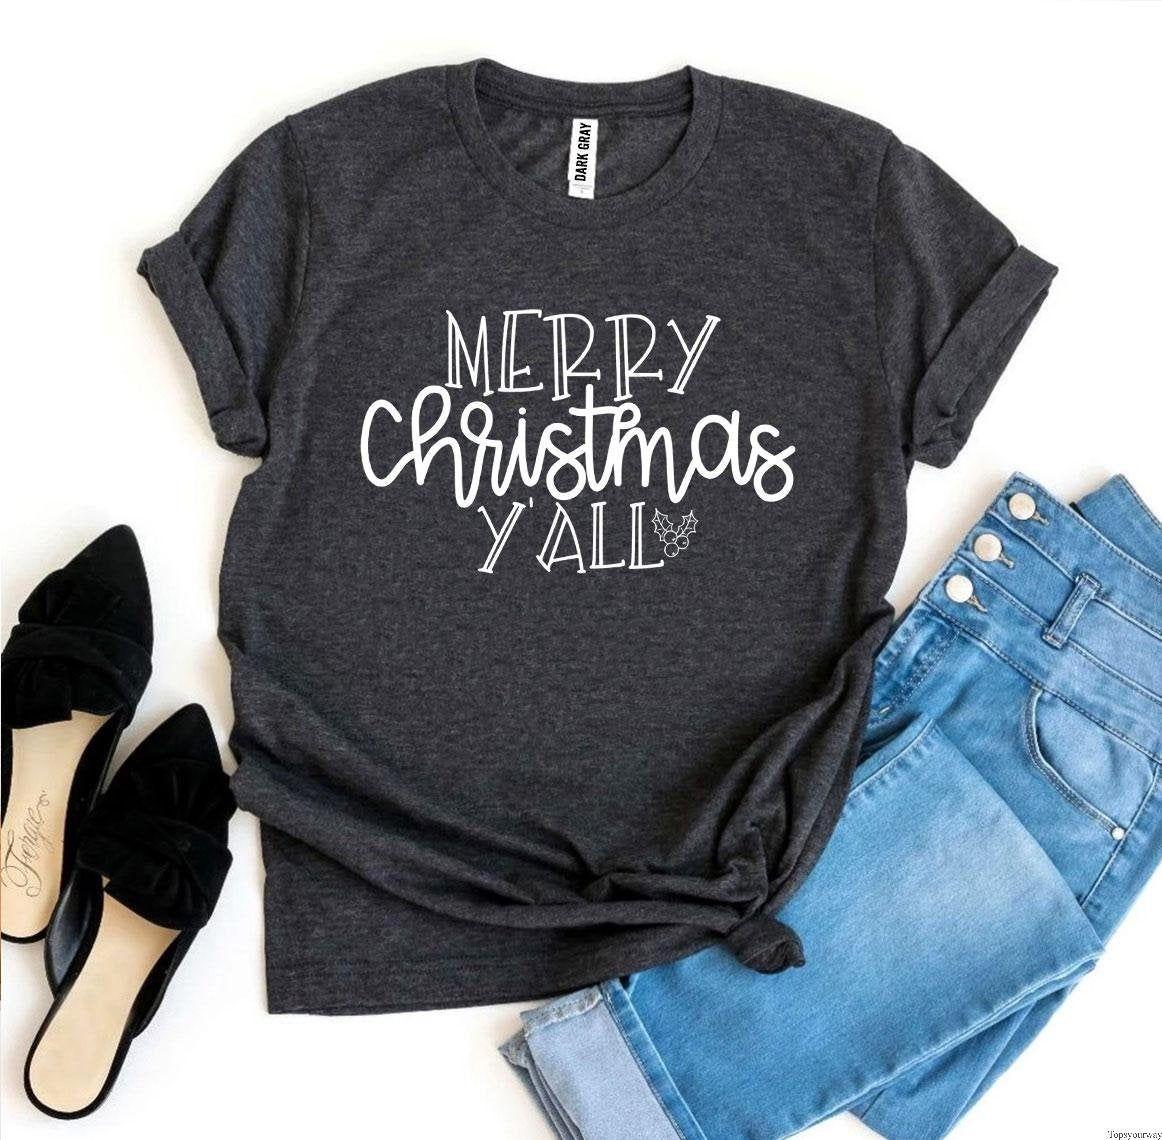 Merry Christmas Y'all T-Shirt, Funny Sarcastic, Christmas Tee, Women's Holiday Shirt, Merry and Bright Shirt, Christmas Gift, Cute Shirts